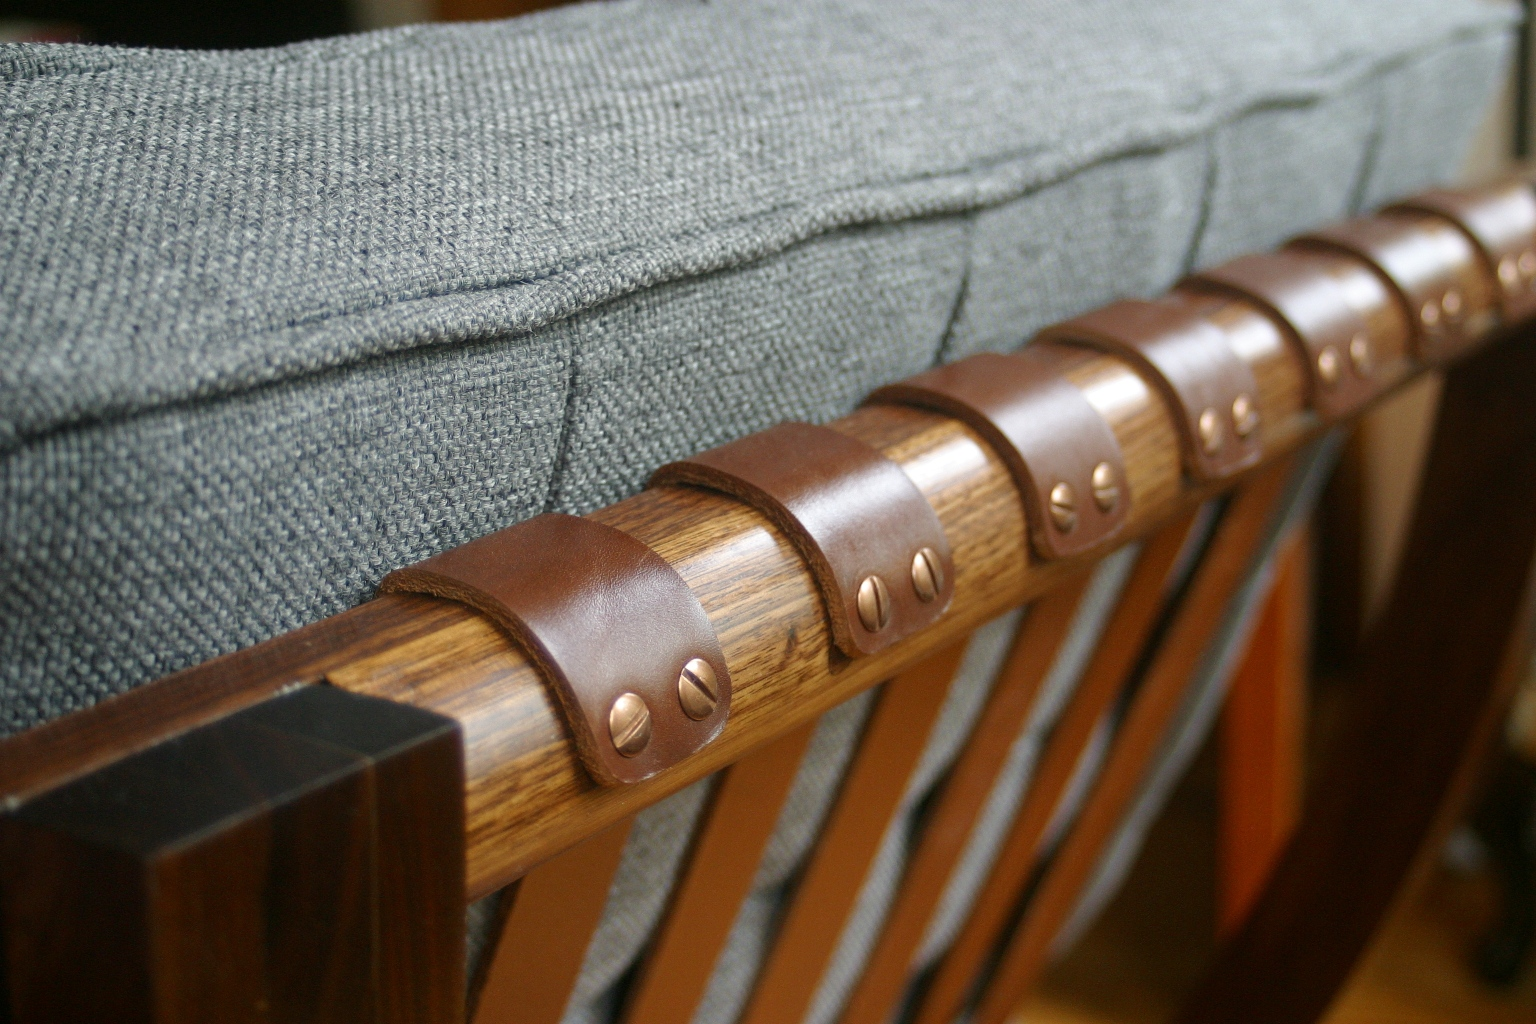 016 - Tess Stelzer Barcelona Chair (5).JPG